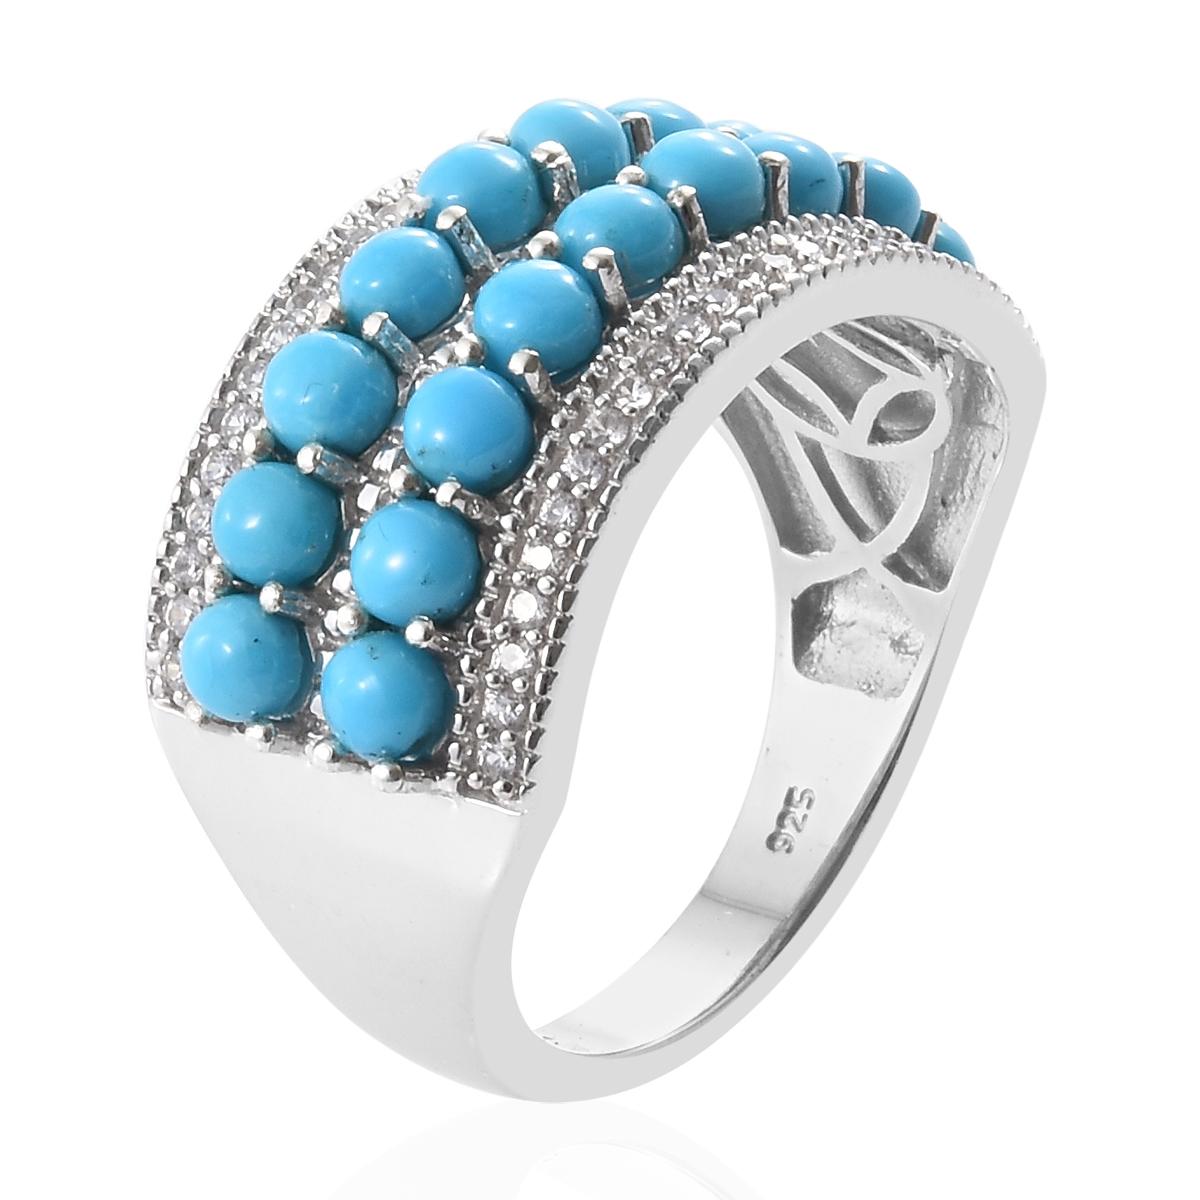 4c577da0f566c6 ... Arizona Sleeping Beauty Turquoise, Cambodian Zircon Platinum Over  Sterling Silver Band Ring (Size 8.0 ...